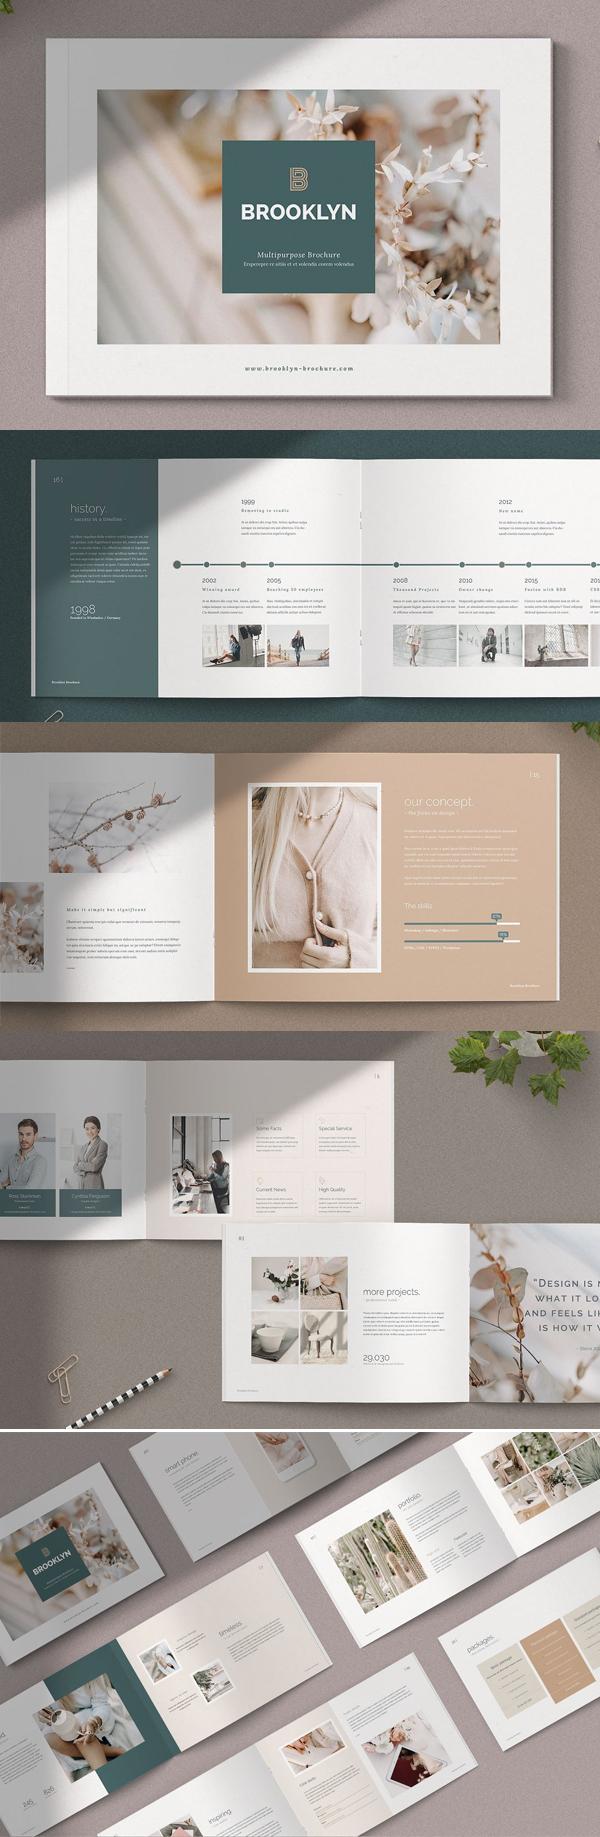 BROOKLYN - Multipurpose Brochure